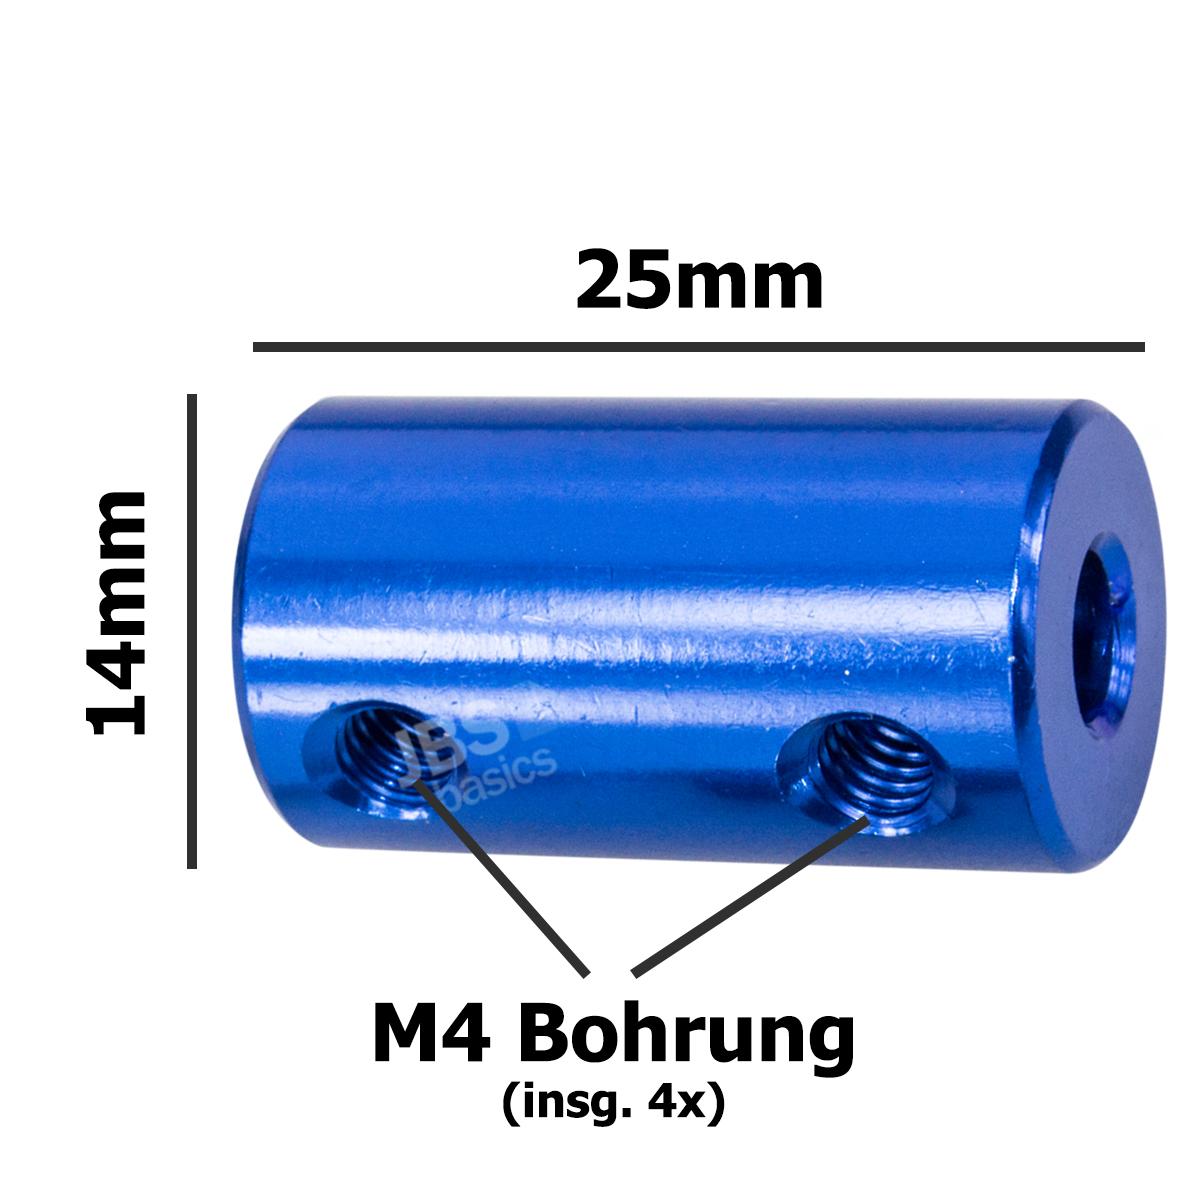 ► 1 Stk 4mm x 5mm Wellenkupplung Verbinder starr 4x5 CNC 3D NEMA BLAU Alu Motor